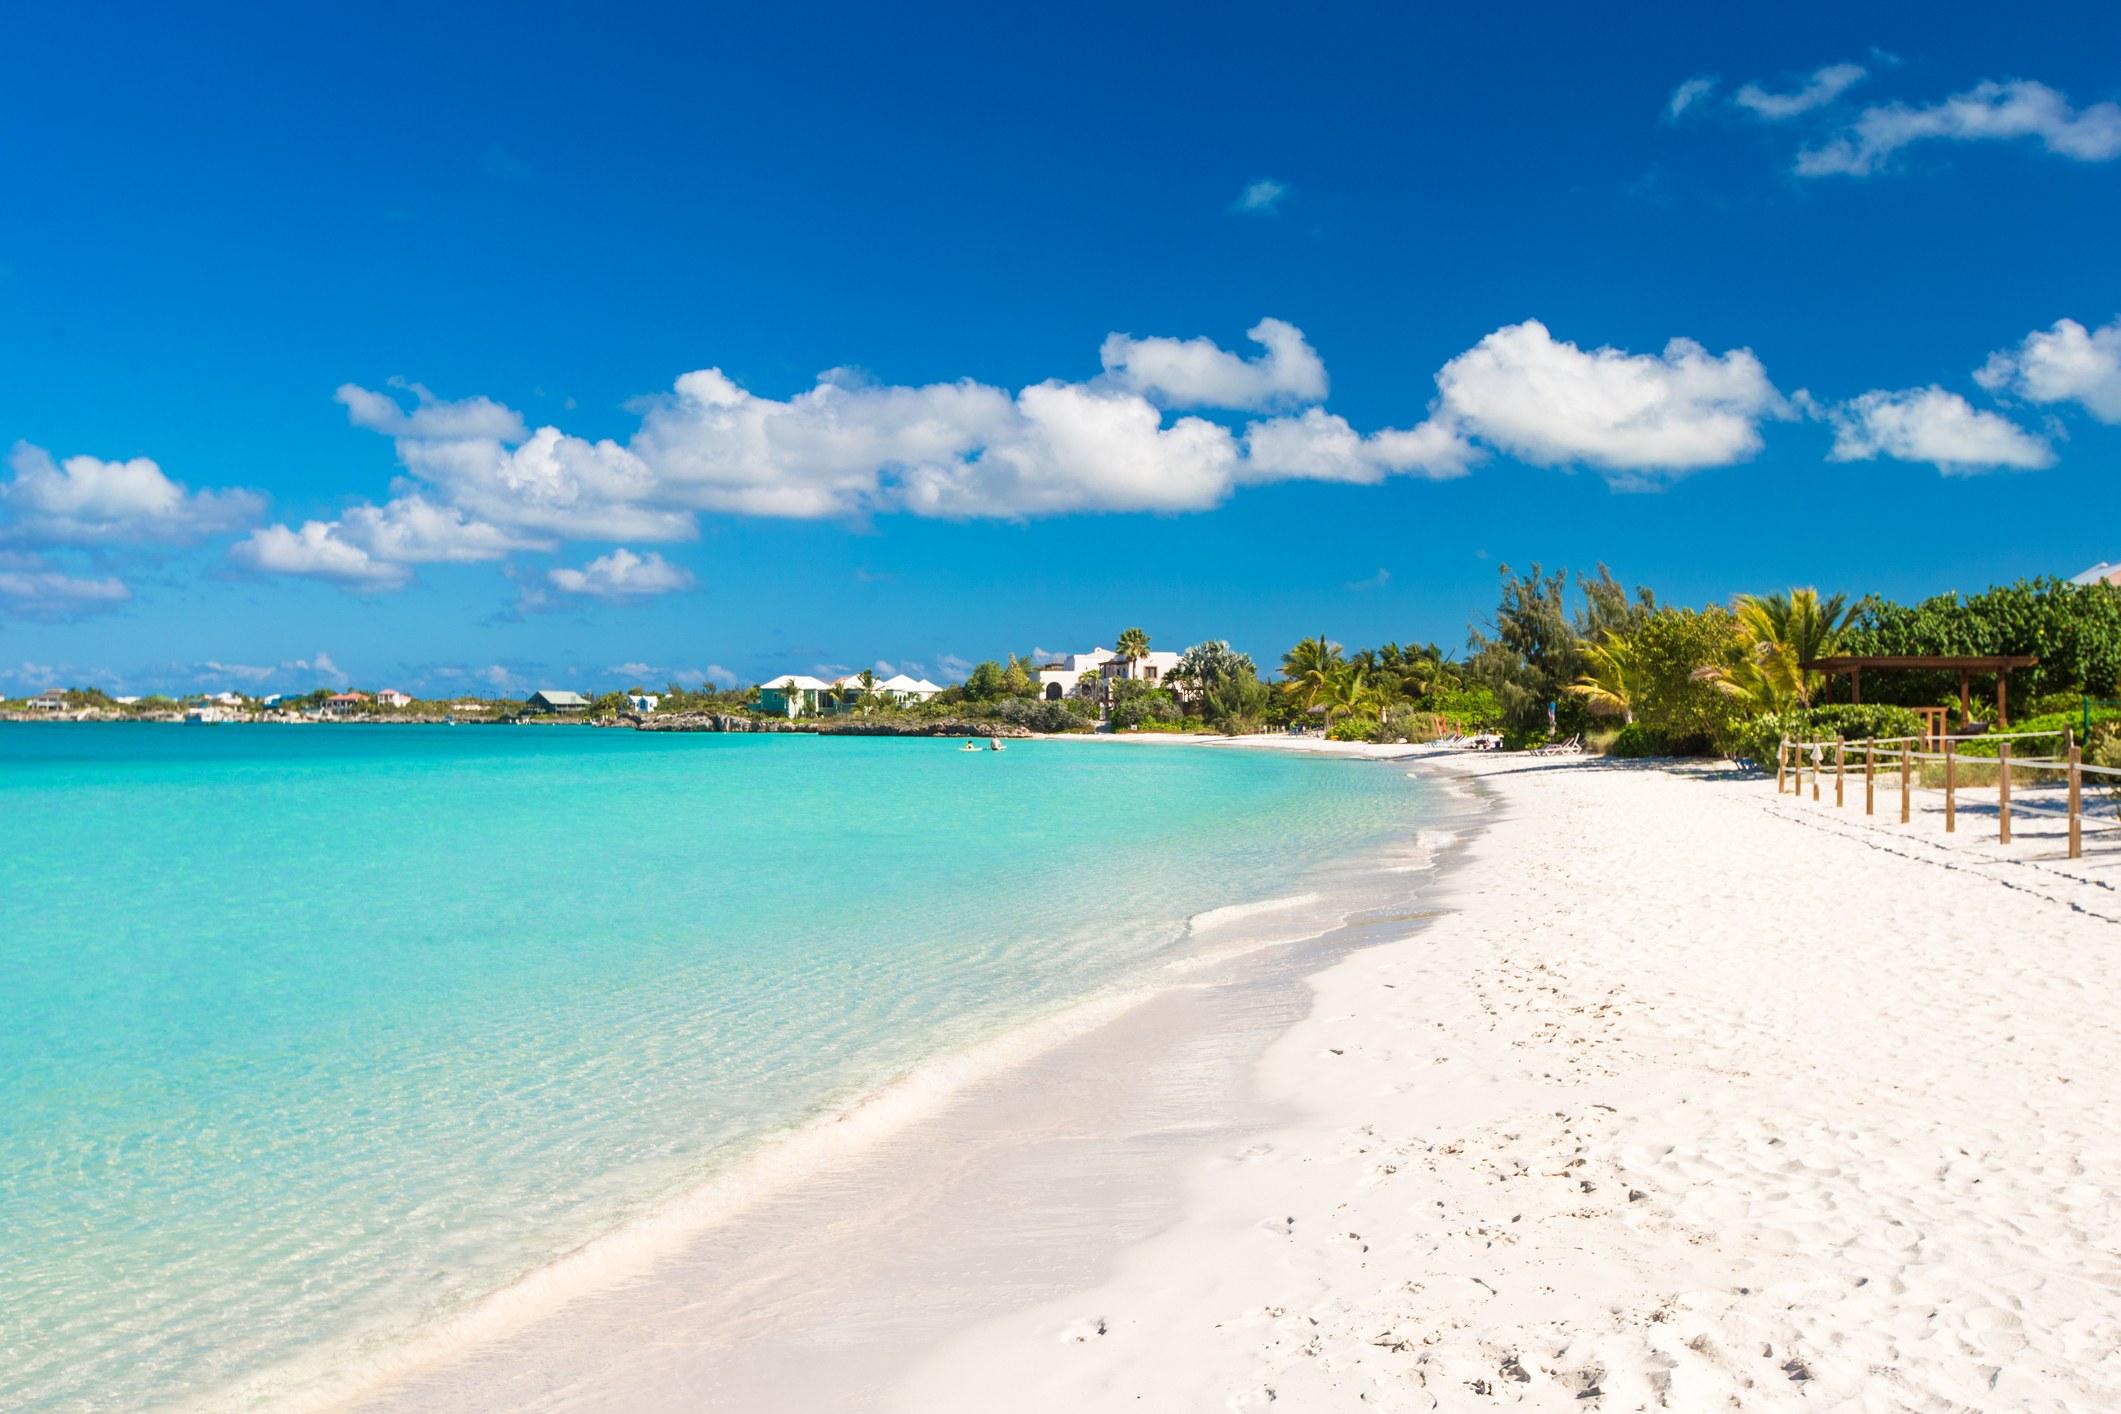 Ideal white beach in the Caribbean island